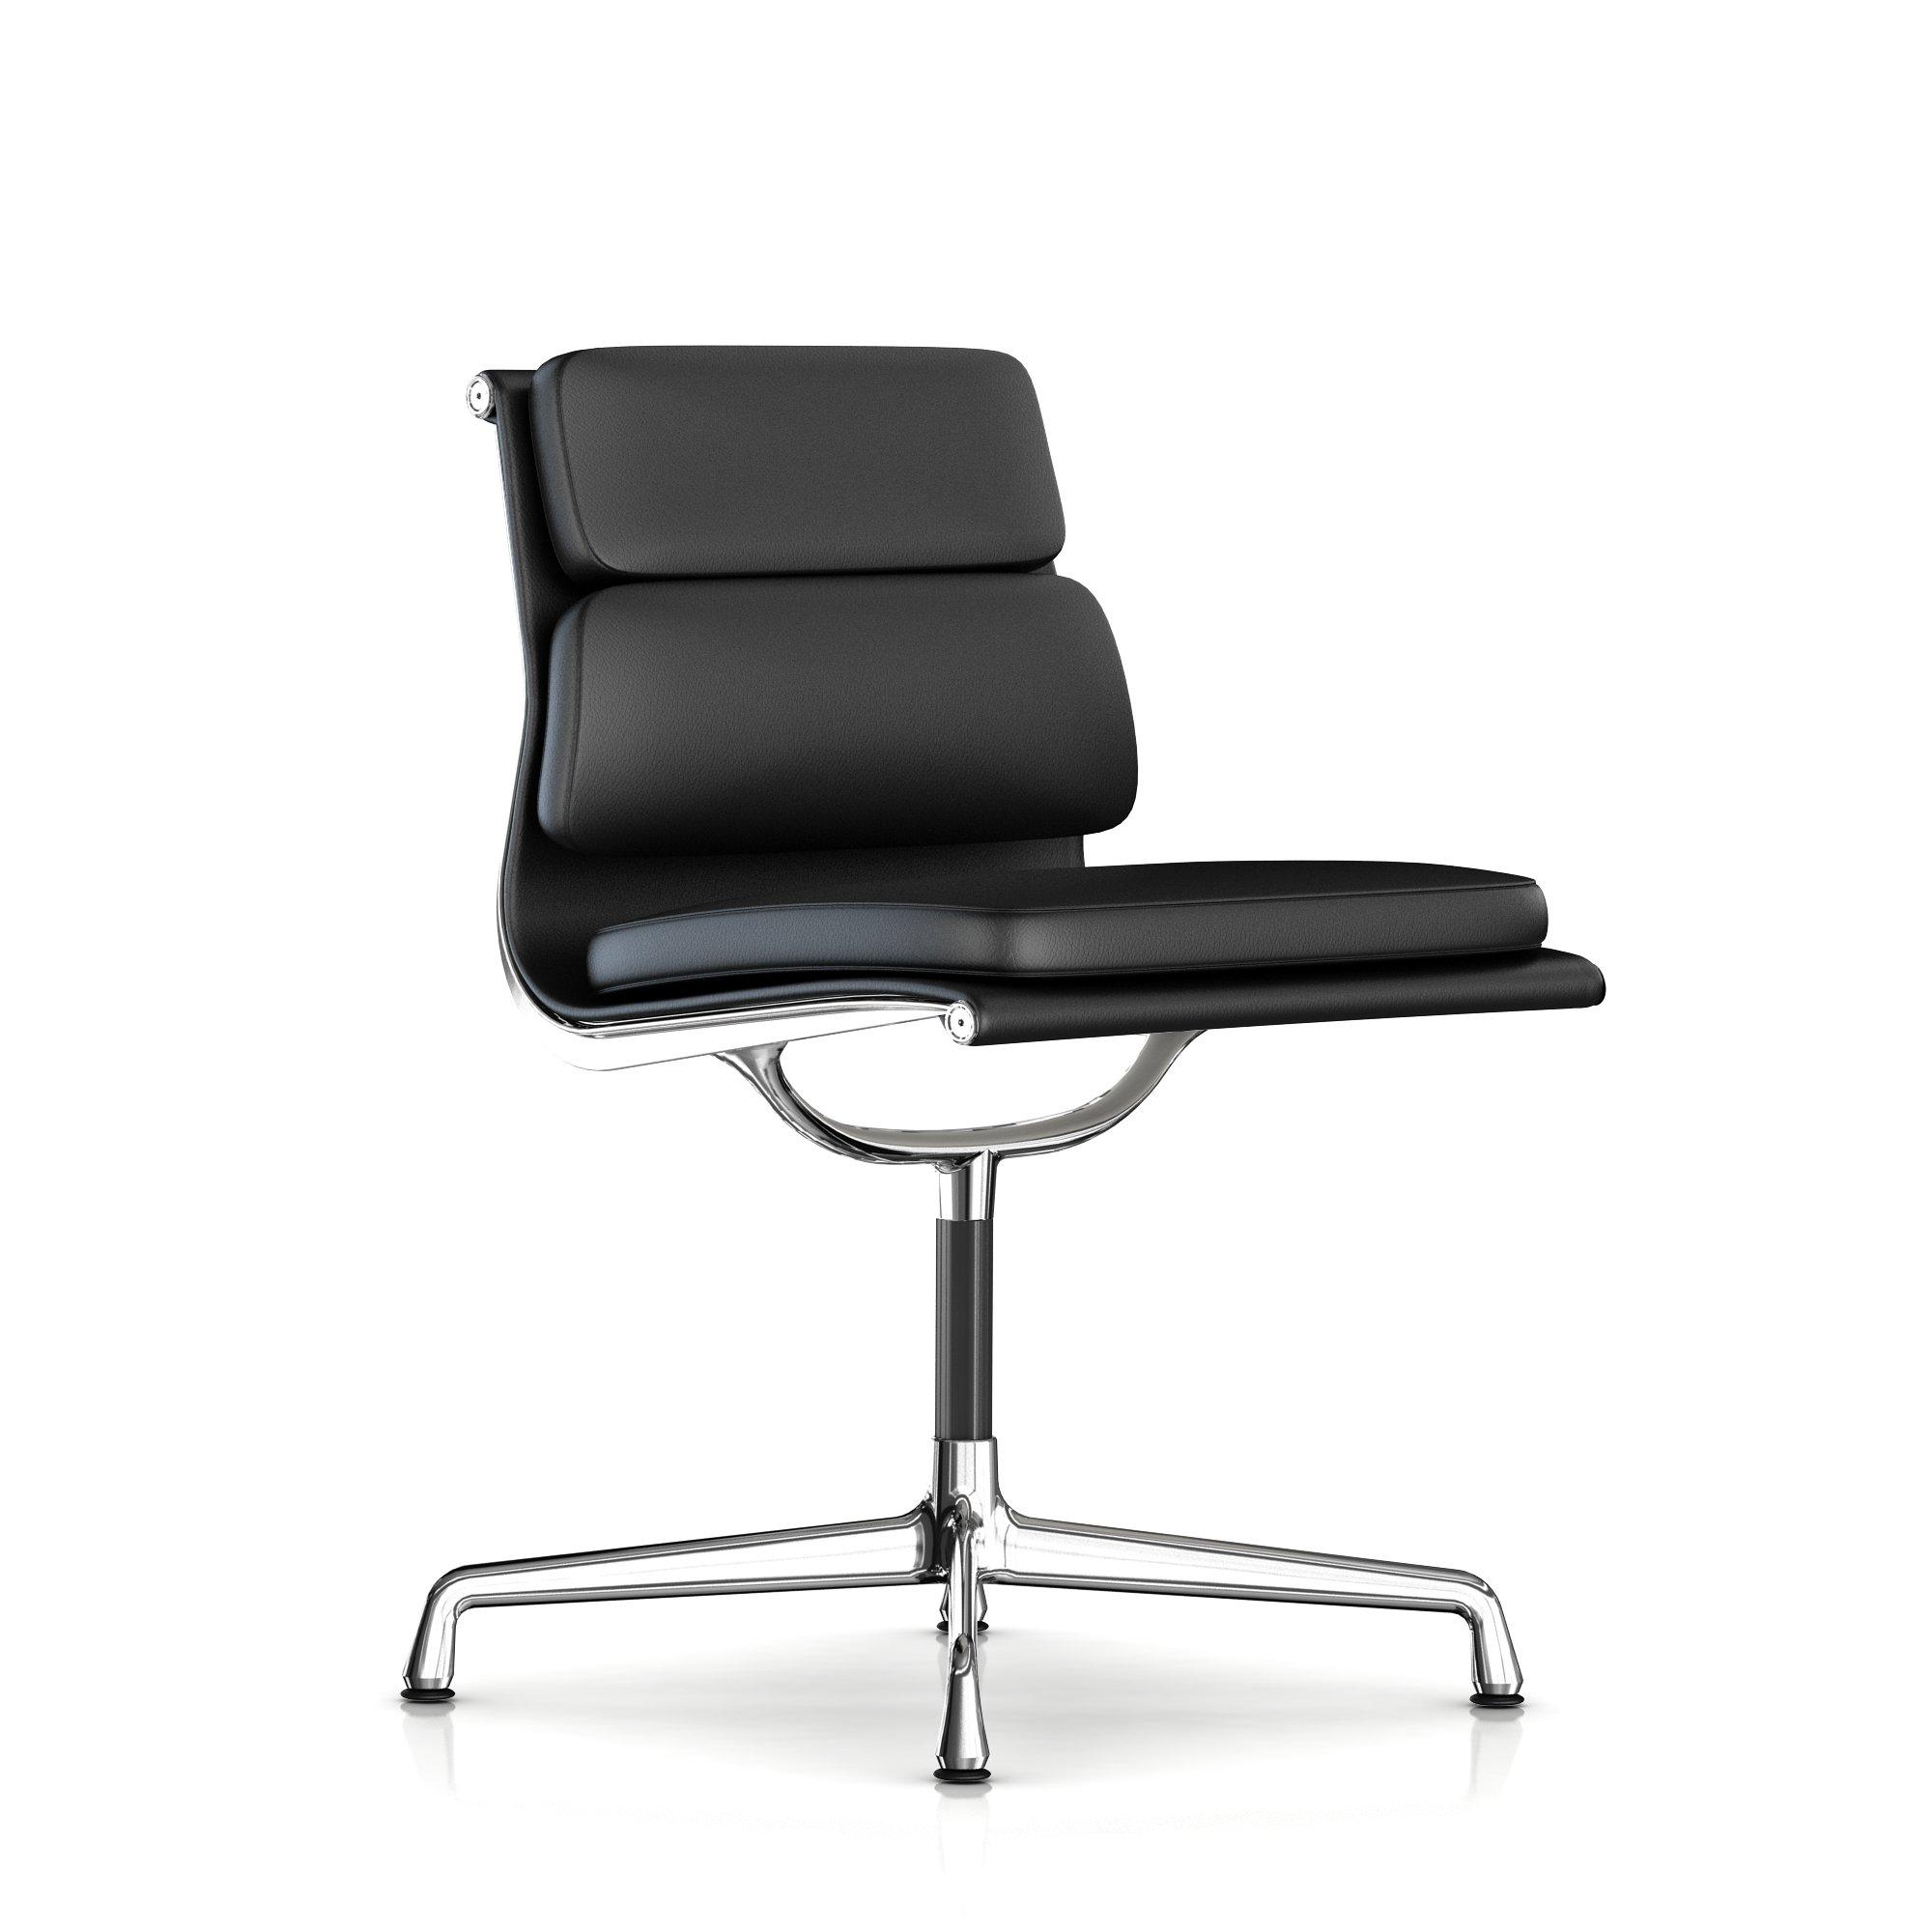 herman miller eames soft pad chair side chair gr shop canada. Black Bedroom Furniture Sets. Home Design Ideas